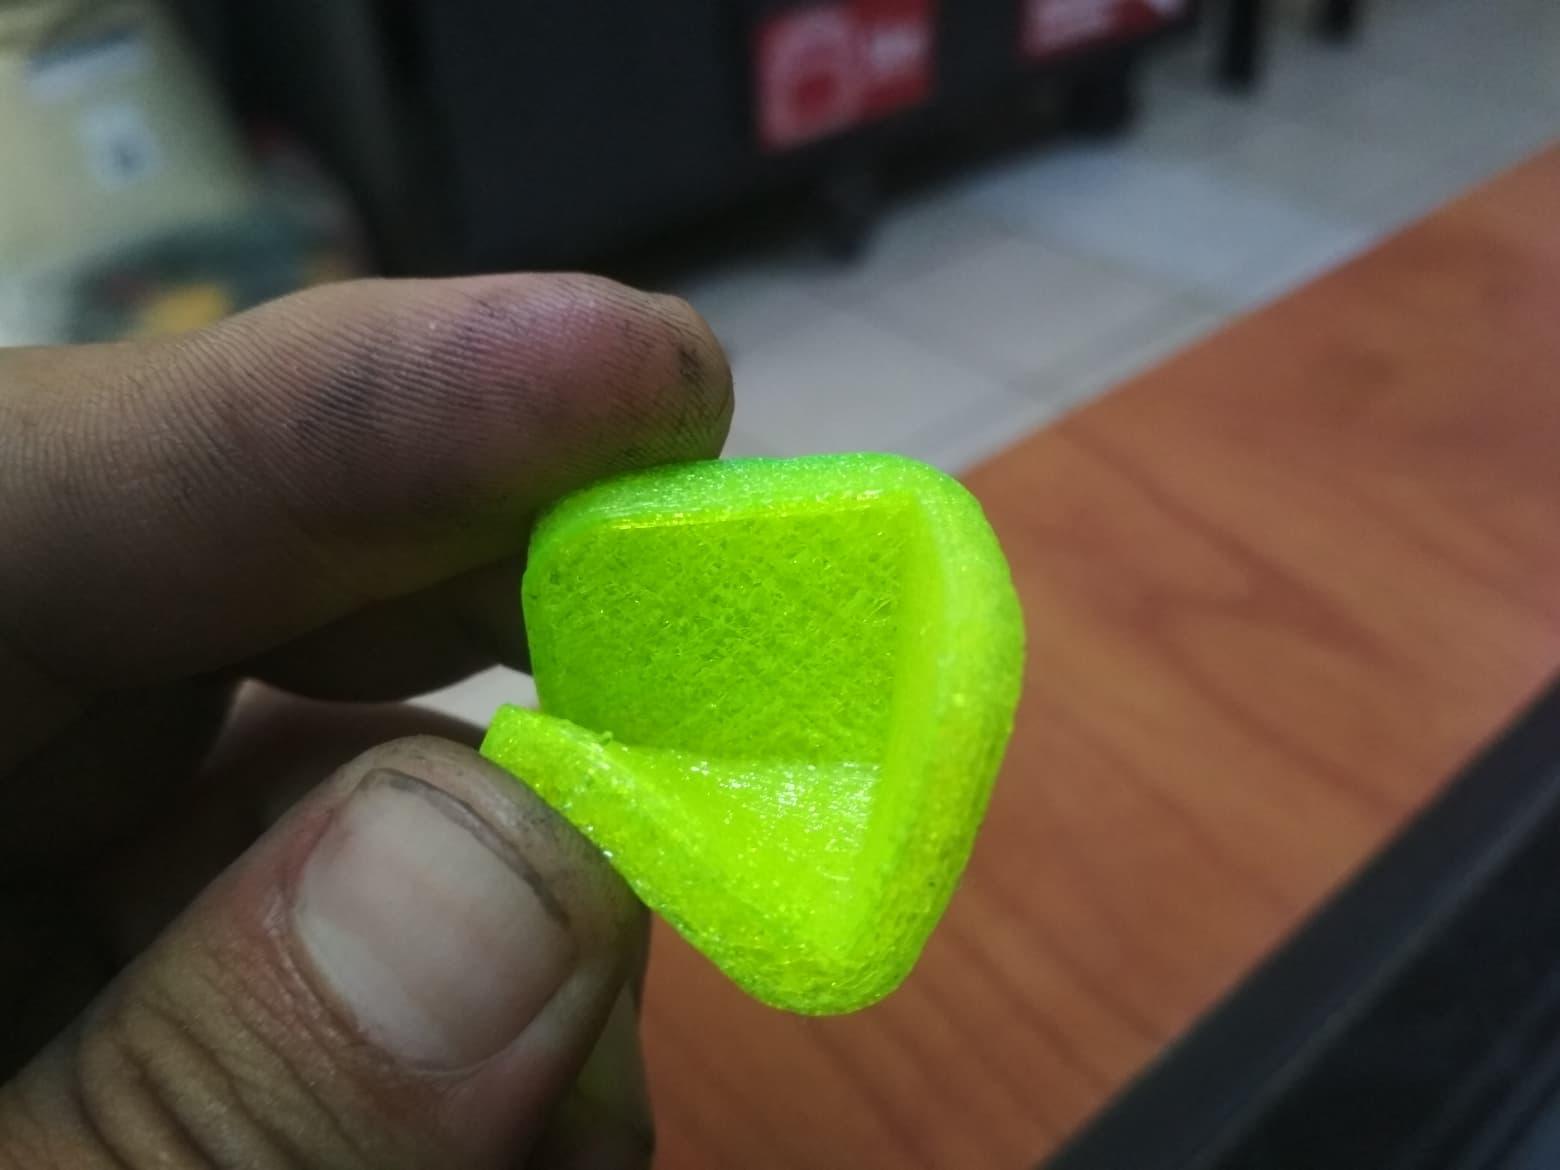 68905704_678447985900466_4882580381859053568_n.jpg Download free STL file Safety corner • 3D printer model, Platridi